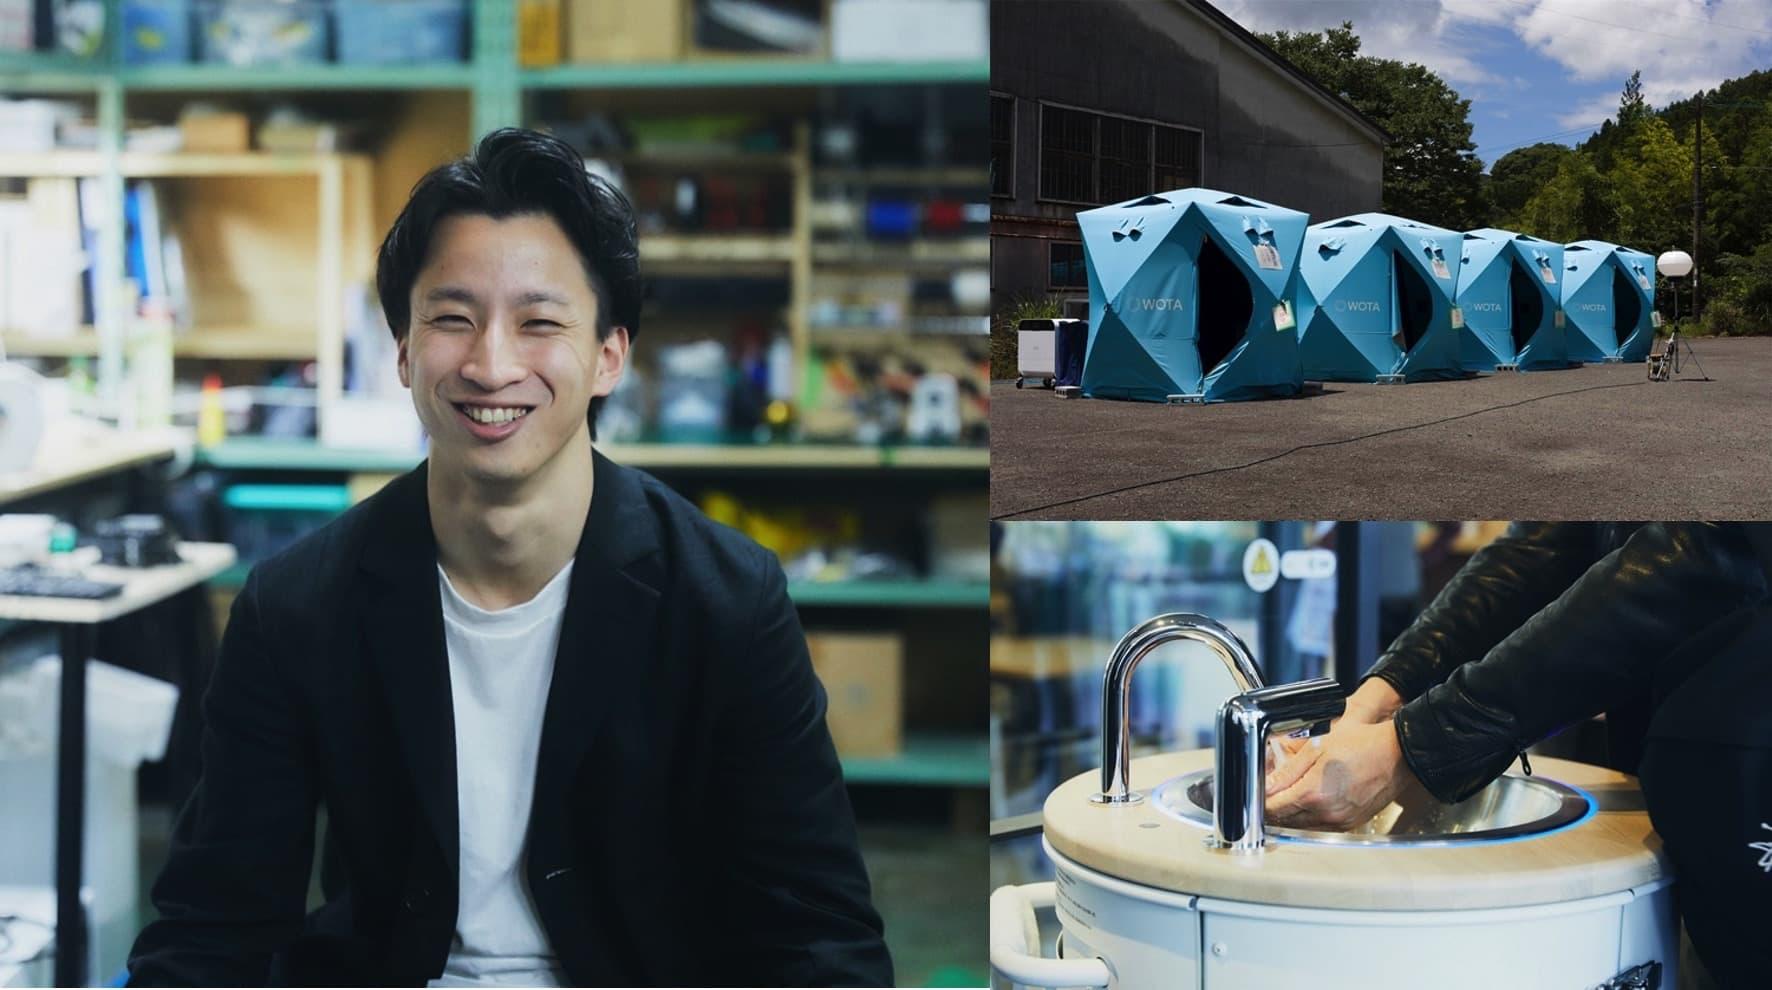 WOTA株式会社代表取締役社長CEO・前田瑶介氏(左)。同社開発の自律分散型水循環システム「WOTA BOX」(右上)と、水循環型ポータブル手洗い機「WOSH」(右上)(画像提供WOTA)